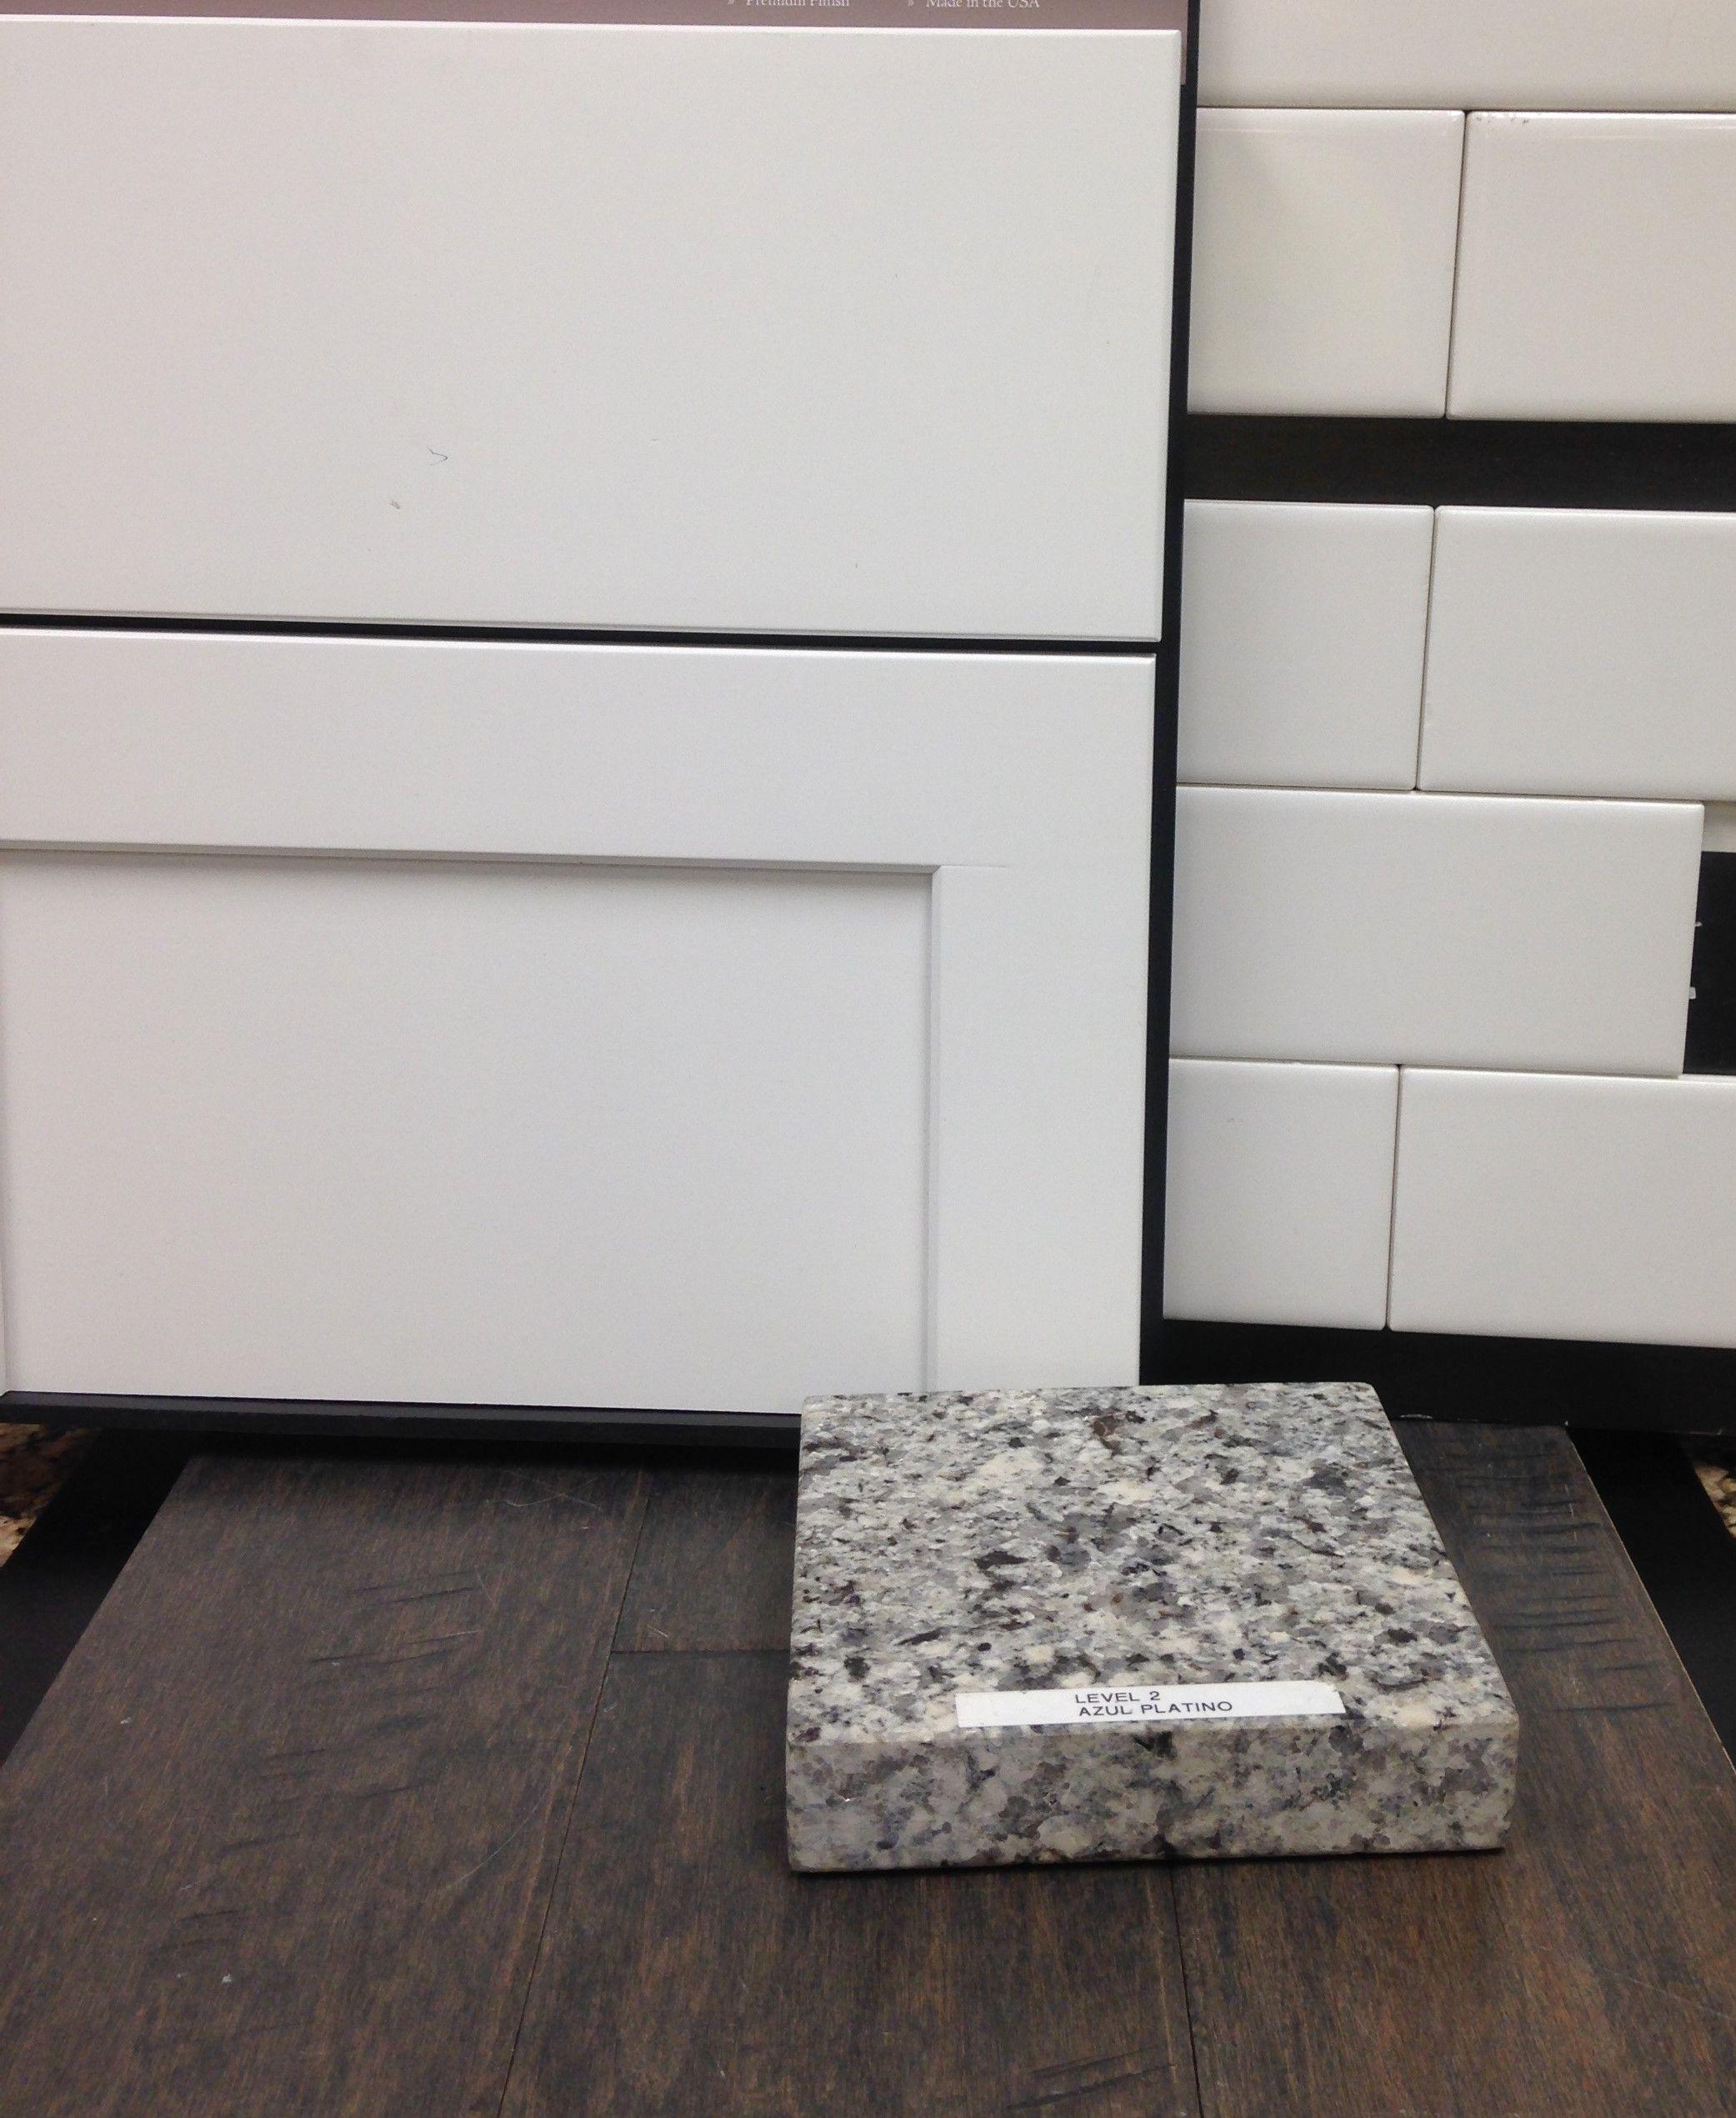 Painted Linen Cabinets White Subway Tile Backsplash Azul Platino Granite Kitchen Remodel Design Replacing Kitchen Countertops Granite Countertops